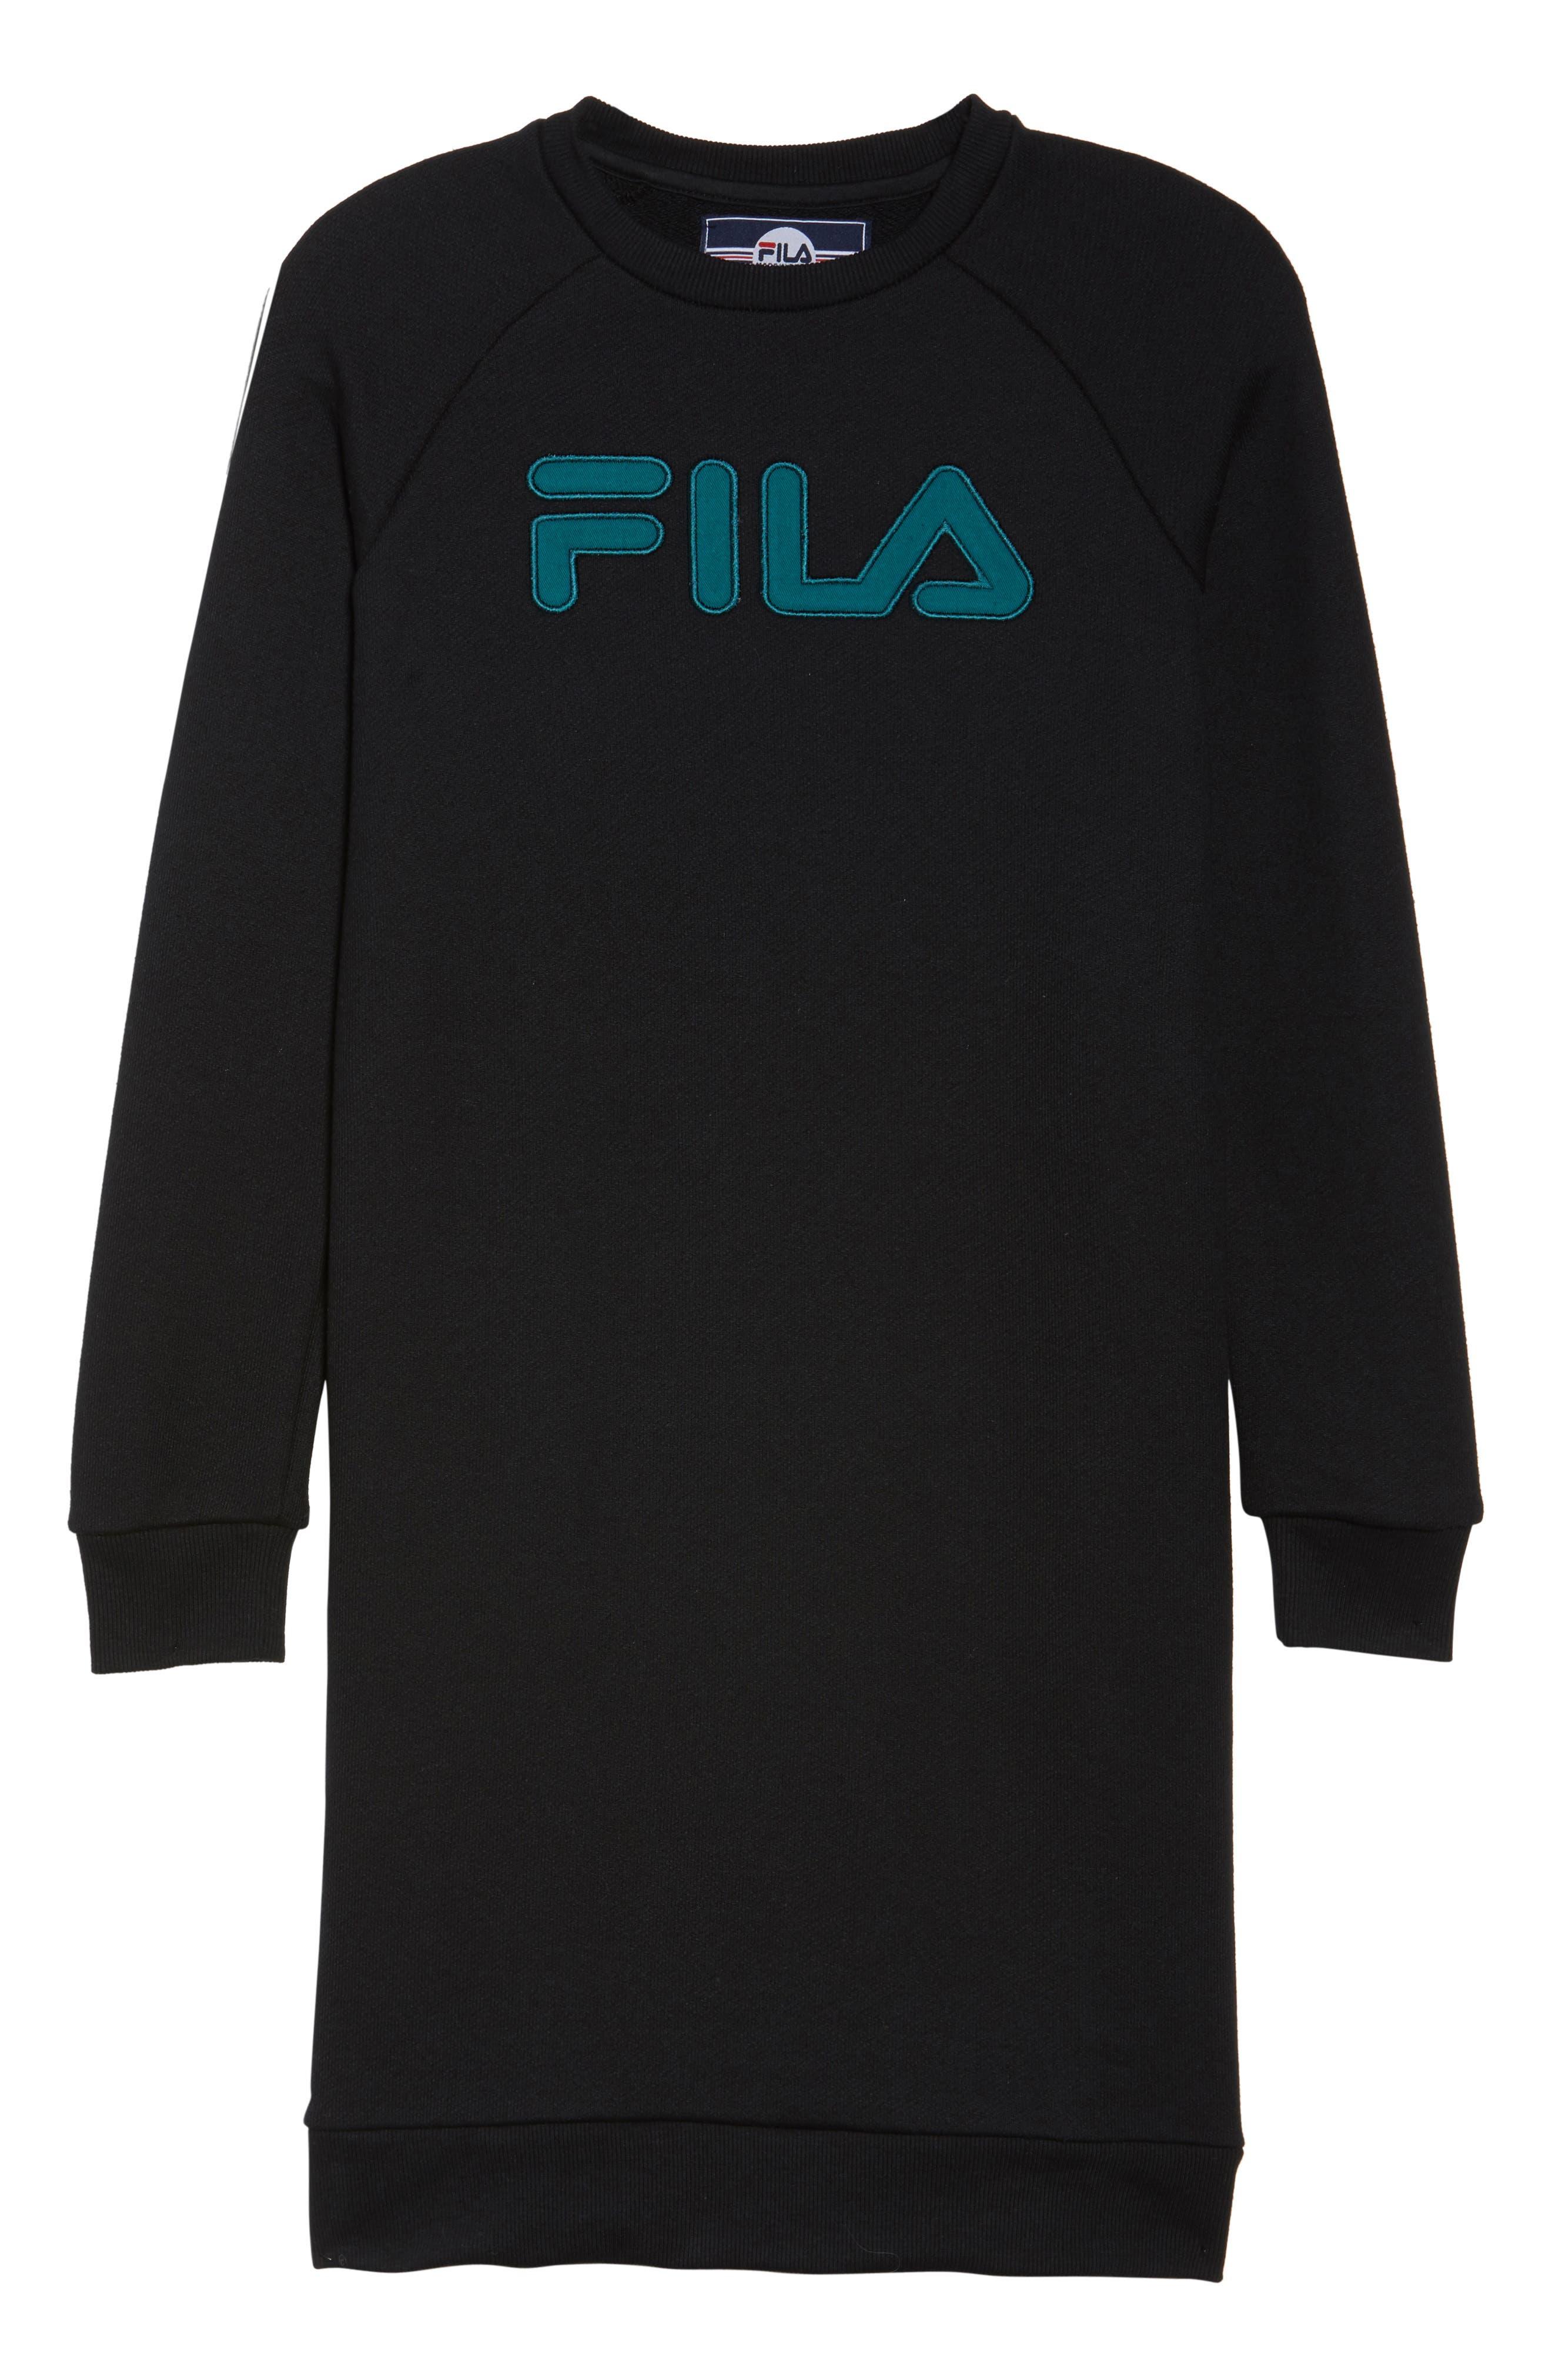 FILA,                             Courtney Sweatshirt Dress,                             Alternate thumbnail 7, color,                             001